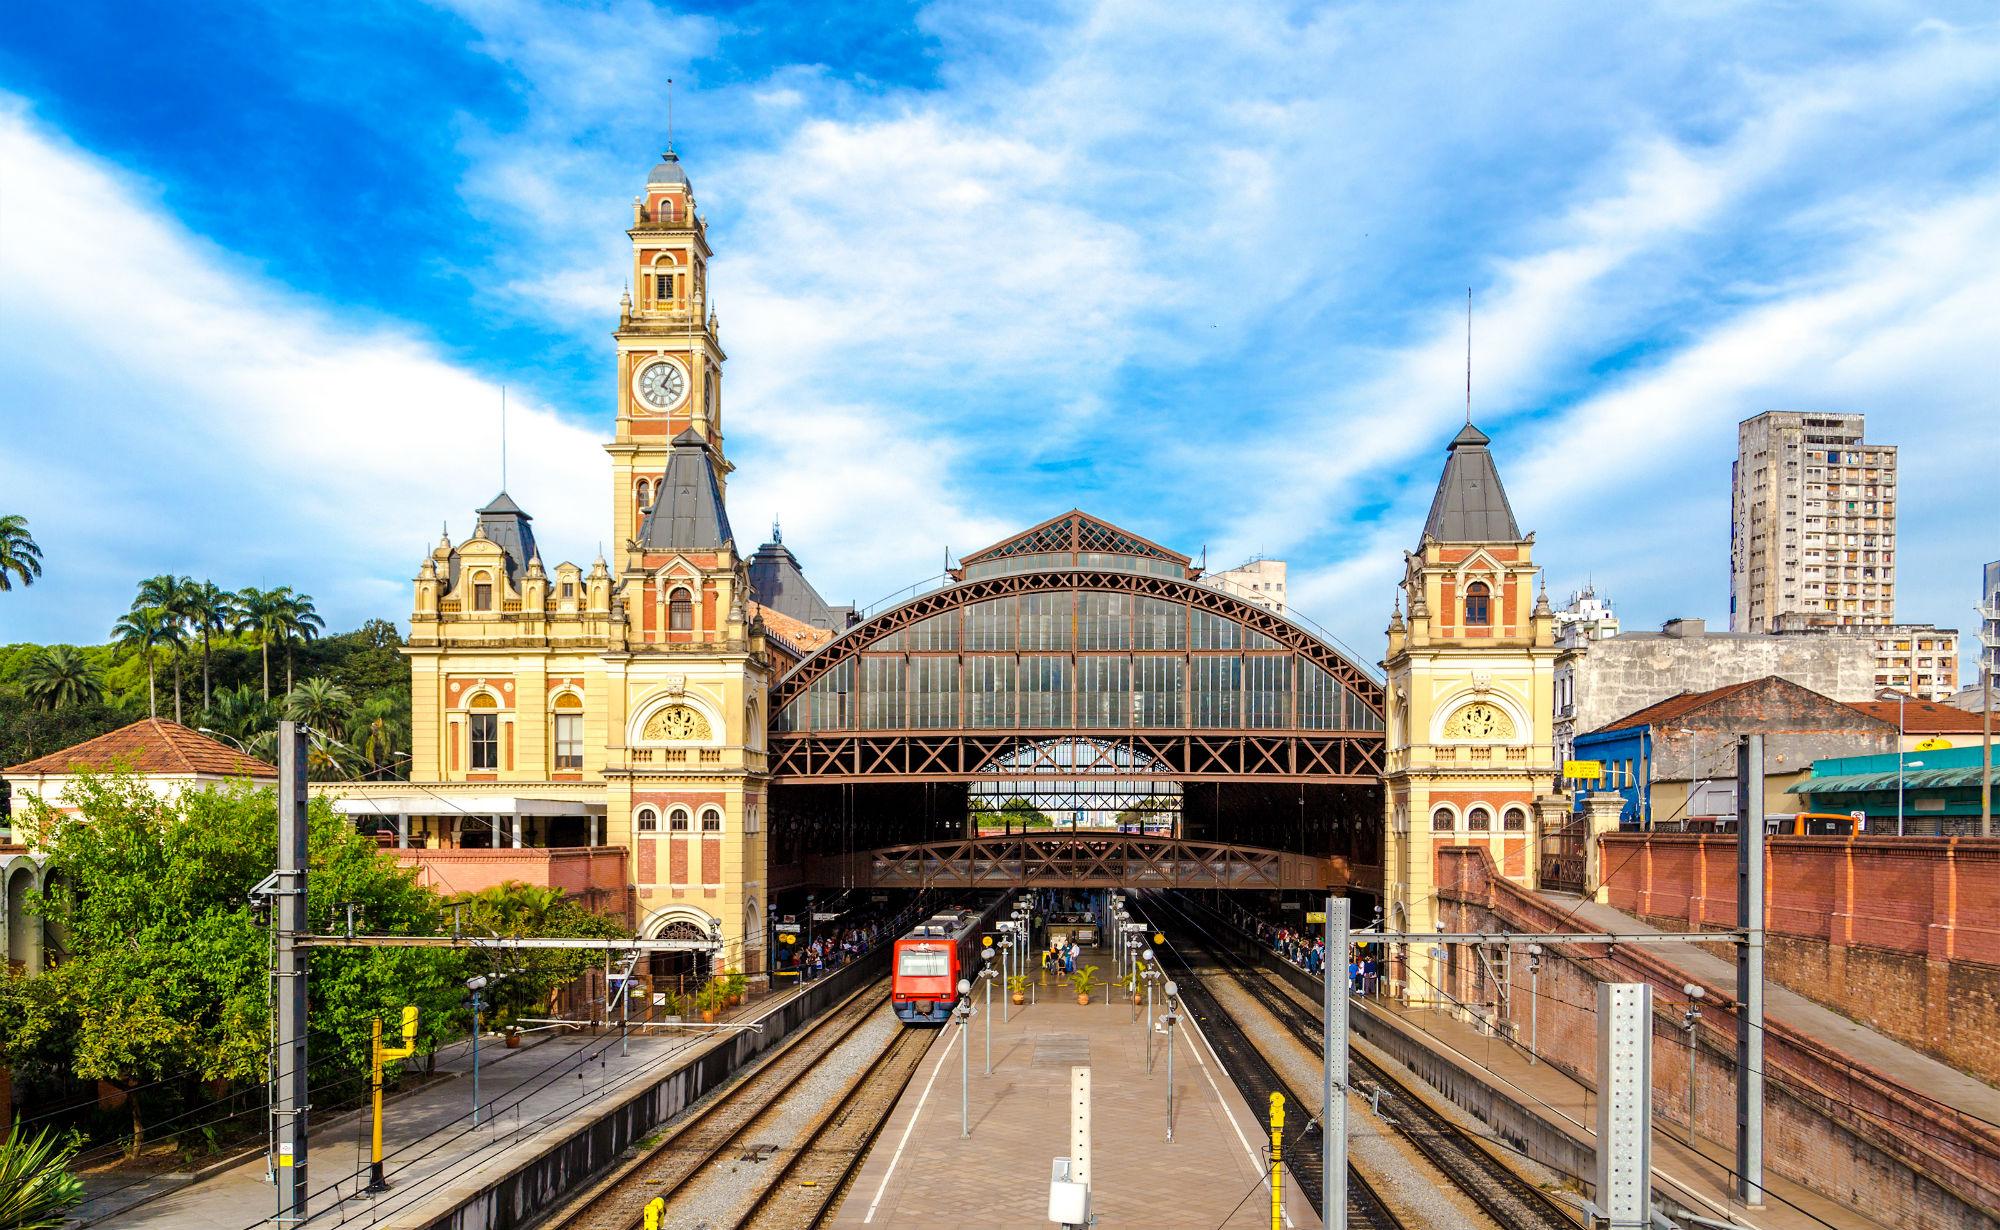 CIOSP 2019 – The 37th Sao Paulo International Dental Meeting